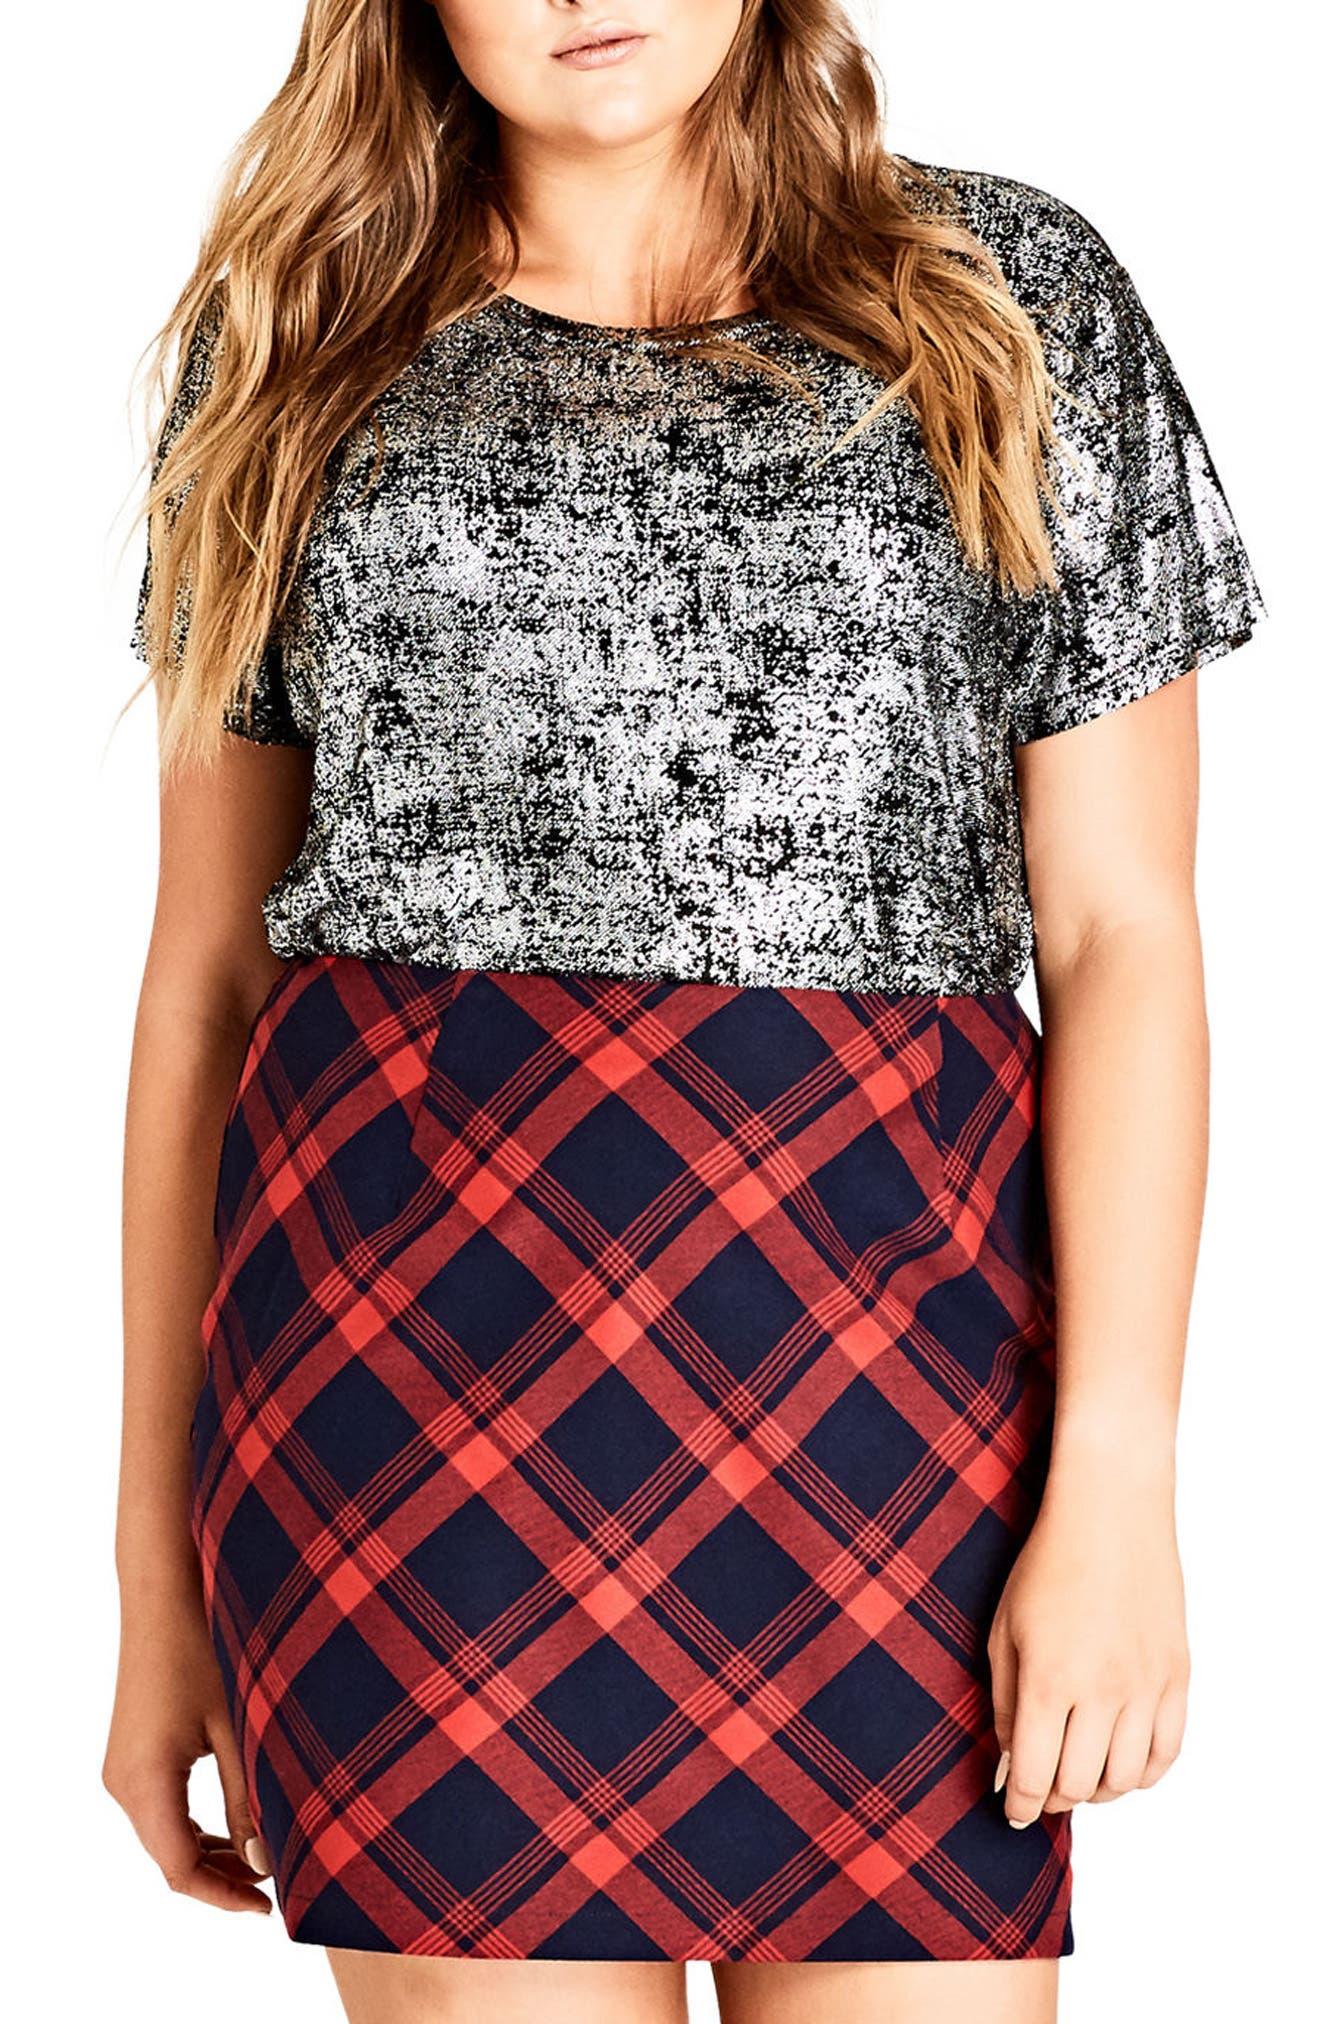 Check Mate Miniskirt,                         Main,                         color, 601